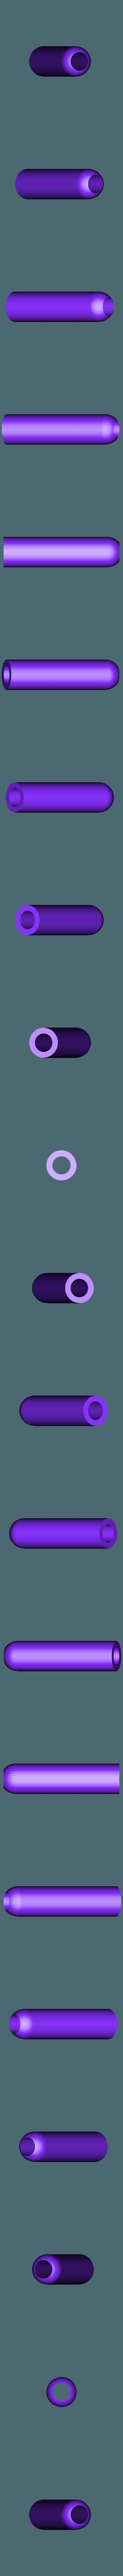 silencerdummy_weaver_v1.stl Download free STL file Triple Weaver Rail with Silencer Dummy • 3D printable model, vmi